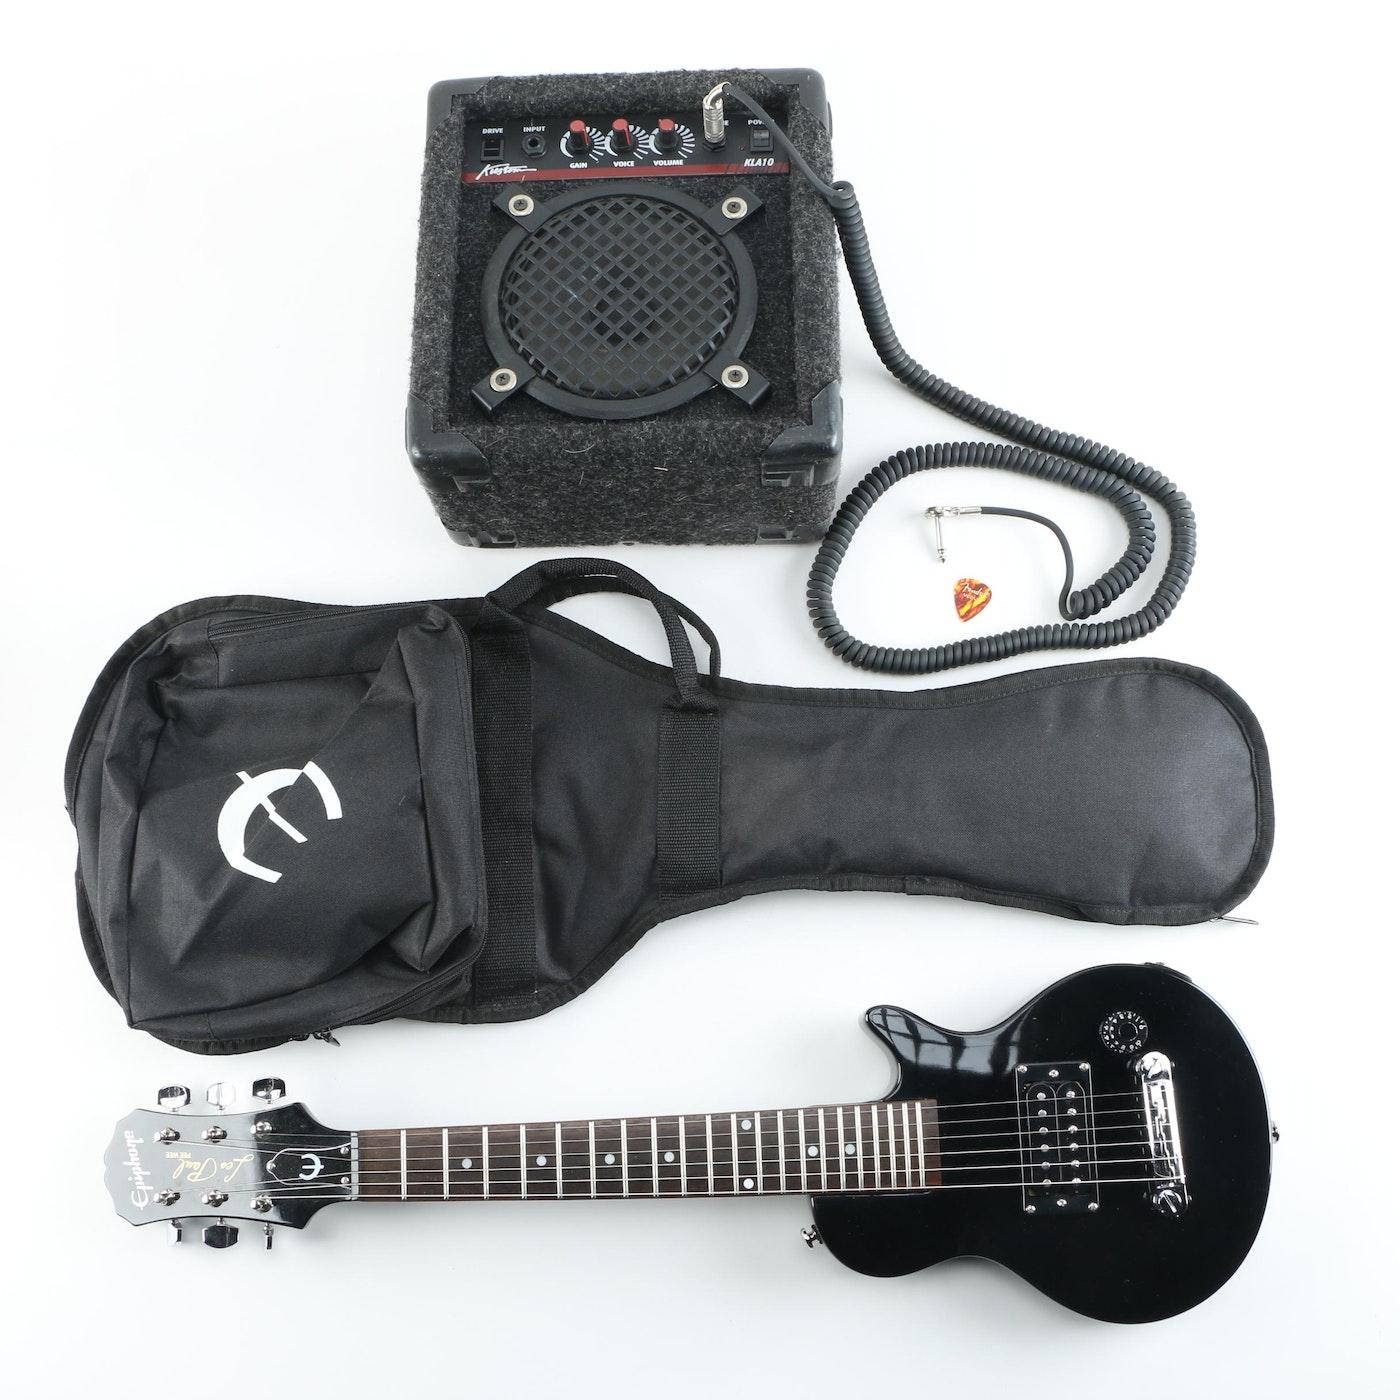 epiphone les paul pee wee electric guitar and kustom practice amp ebth. Black Bedroom Furniture Sets. Home Design Ideas